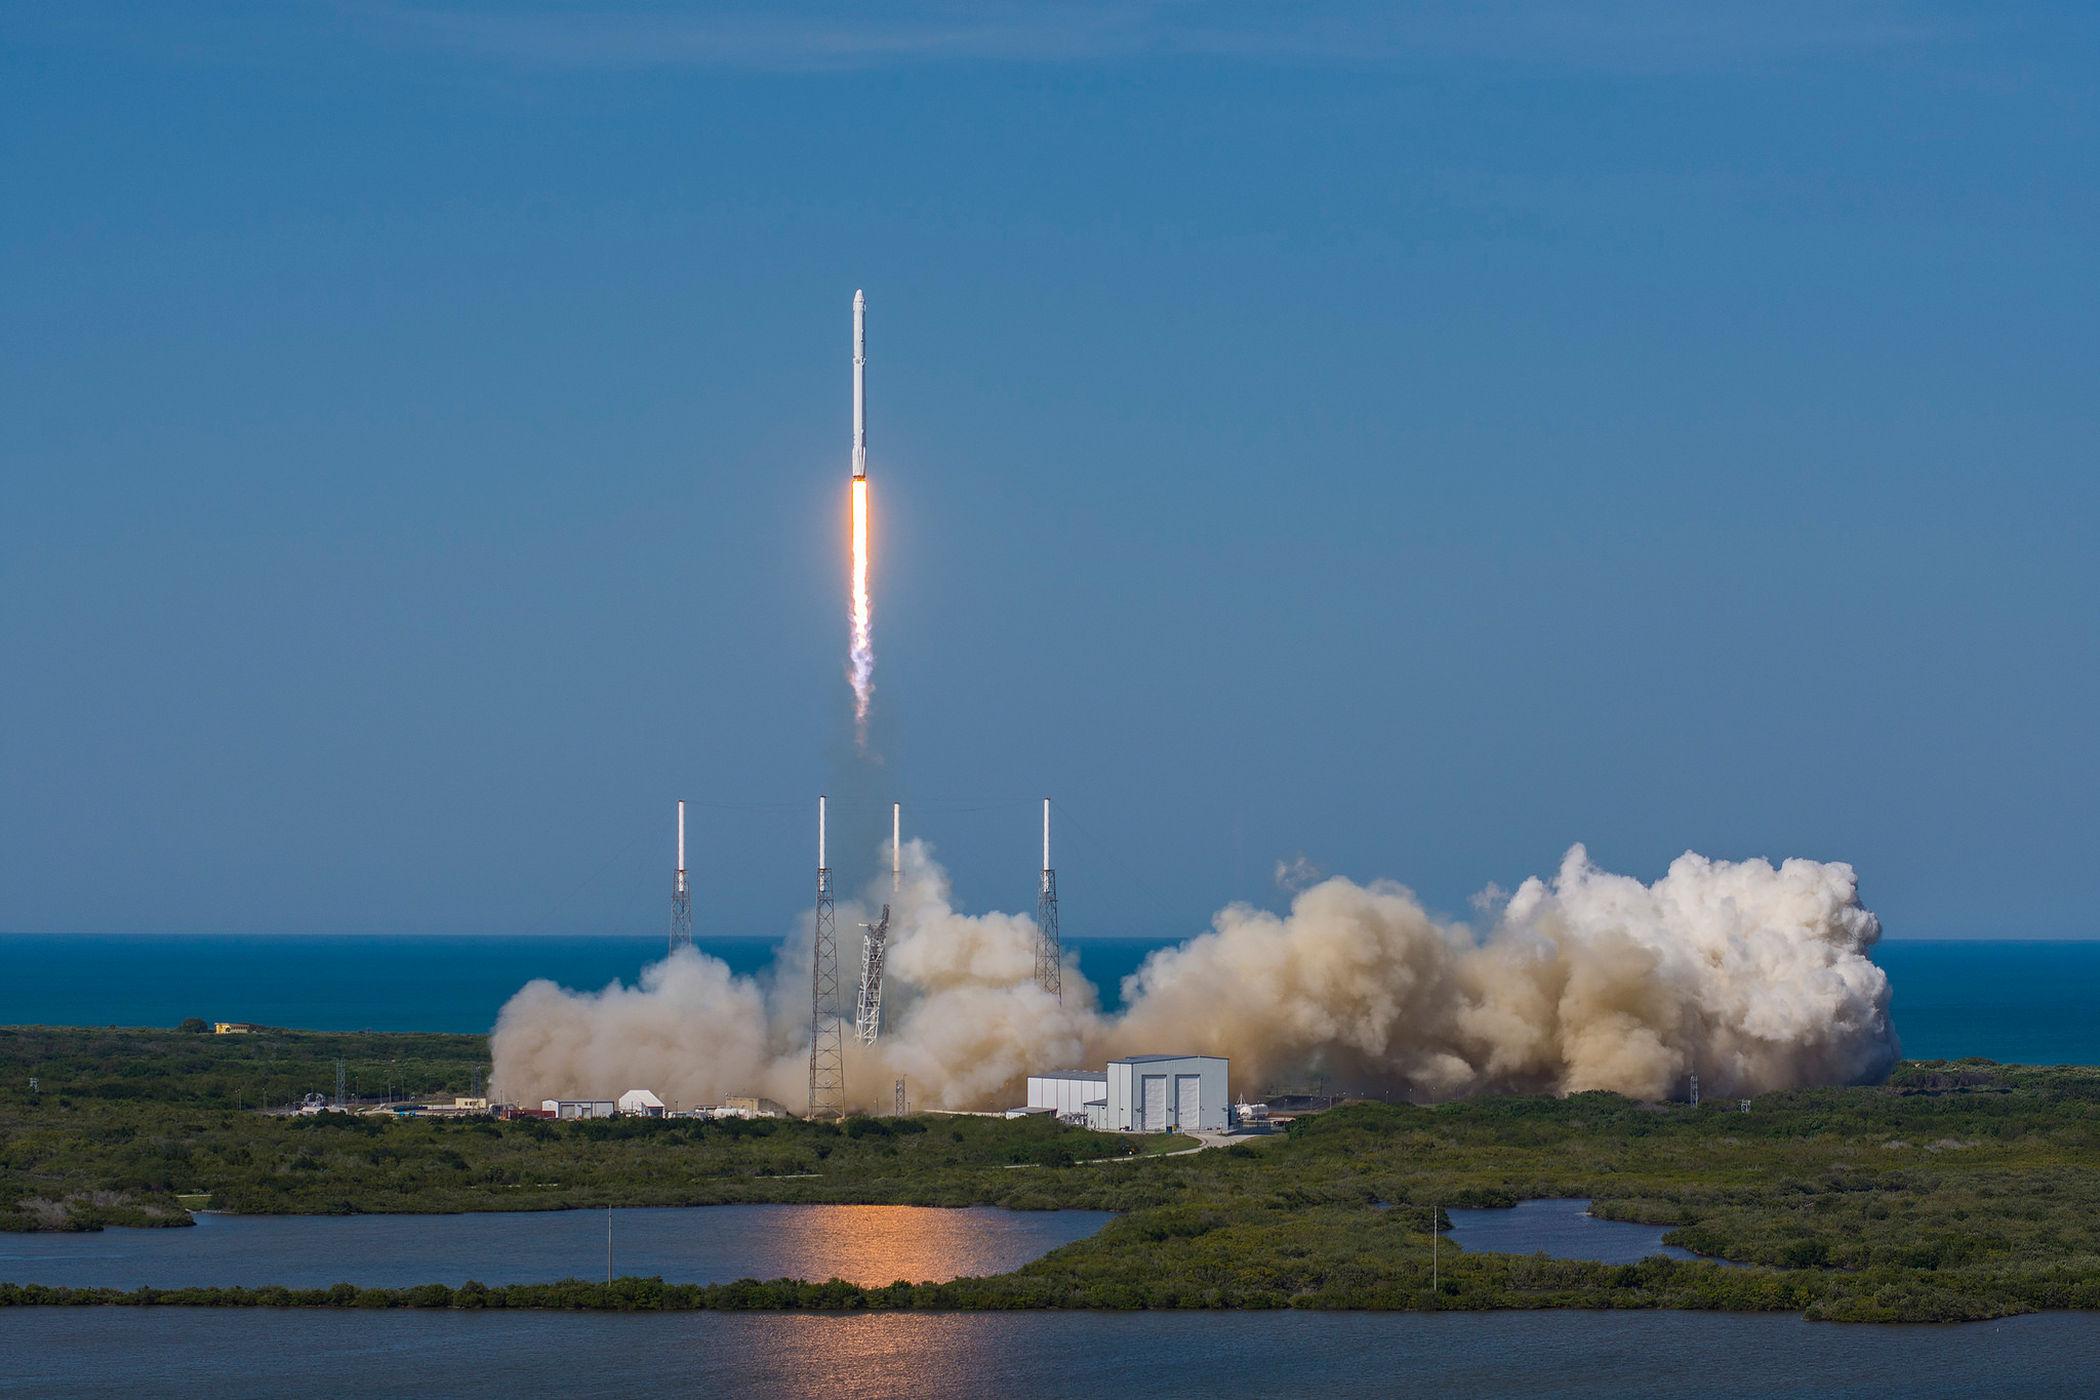 Space X - Falcon 9 FT - Dragon CRS-8 - ISS - Avril 2016 - Launch - lancement - première atterrisage réussi sur barge - first stage landing